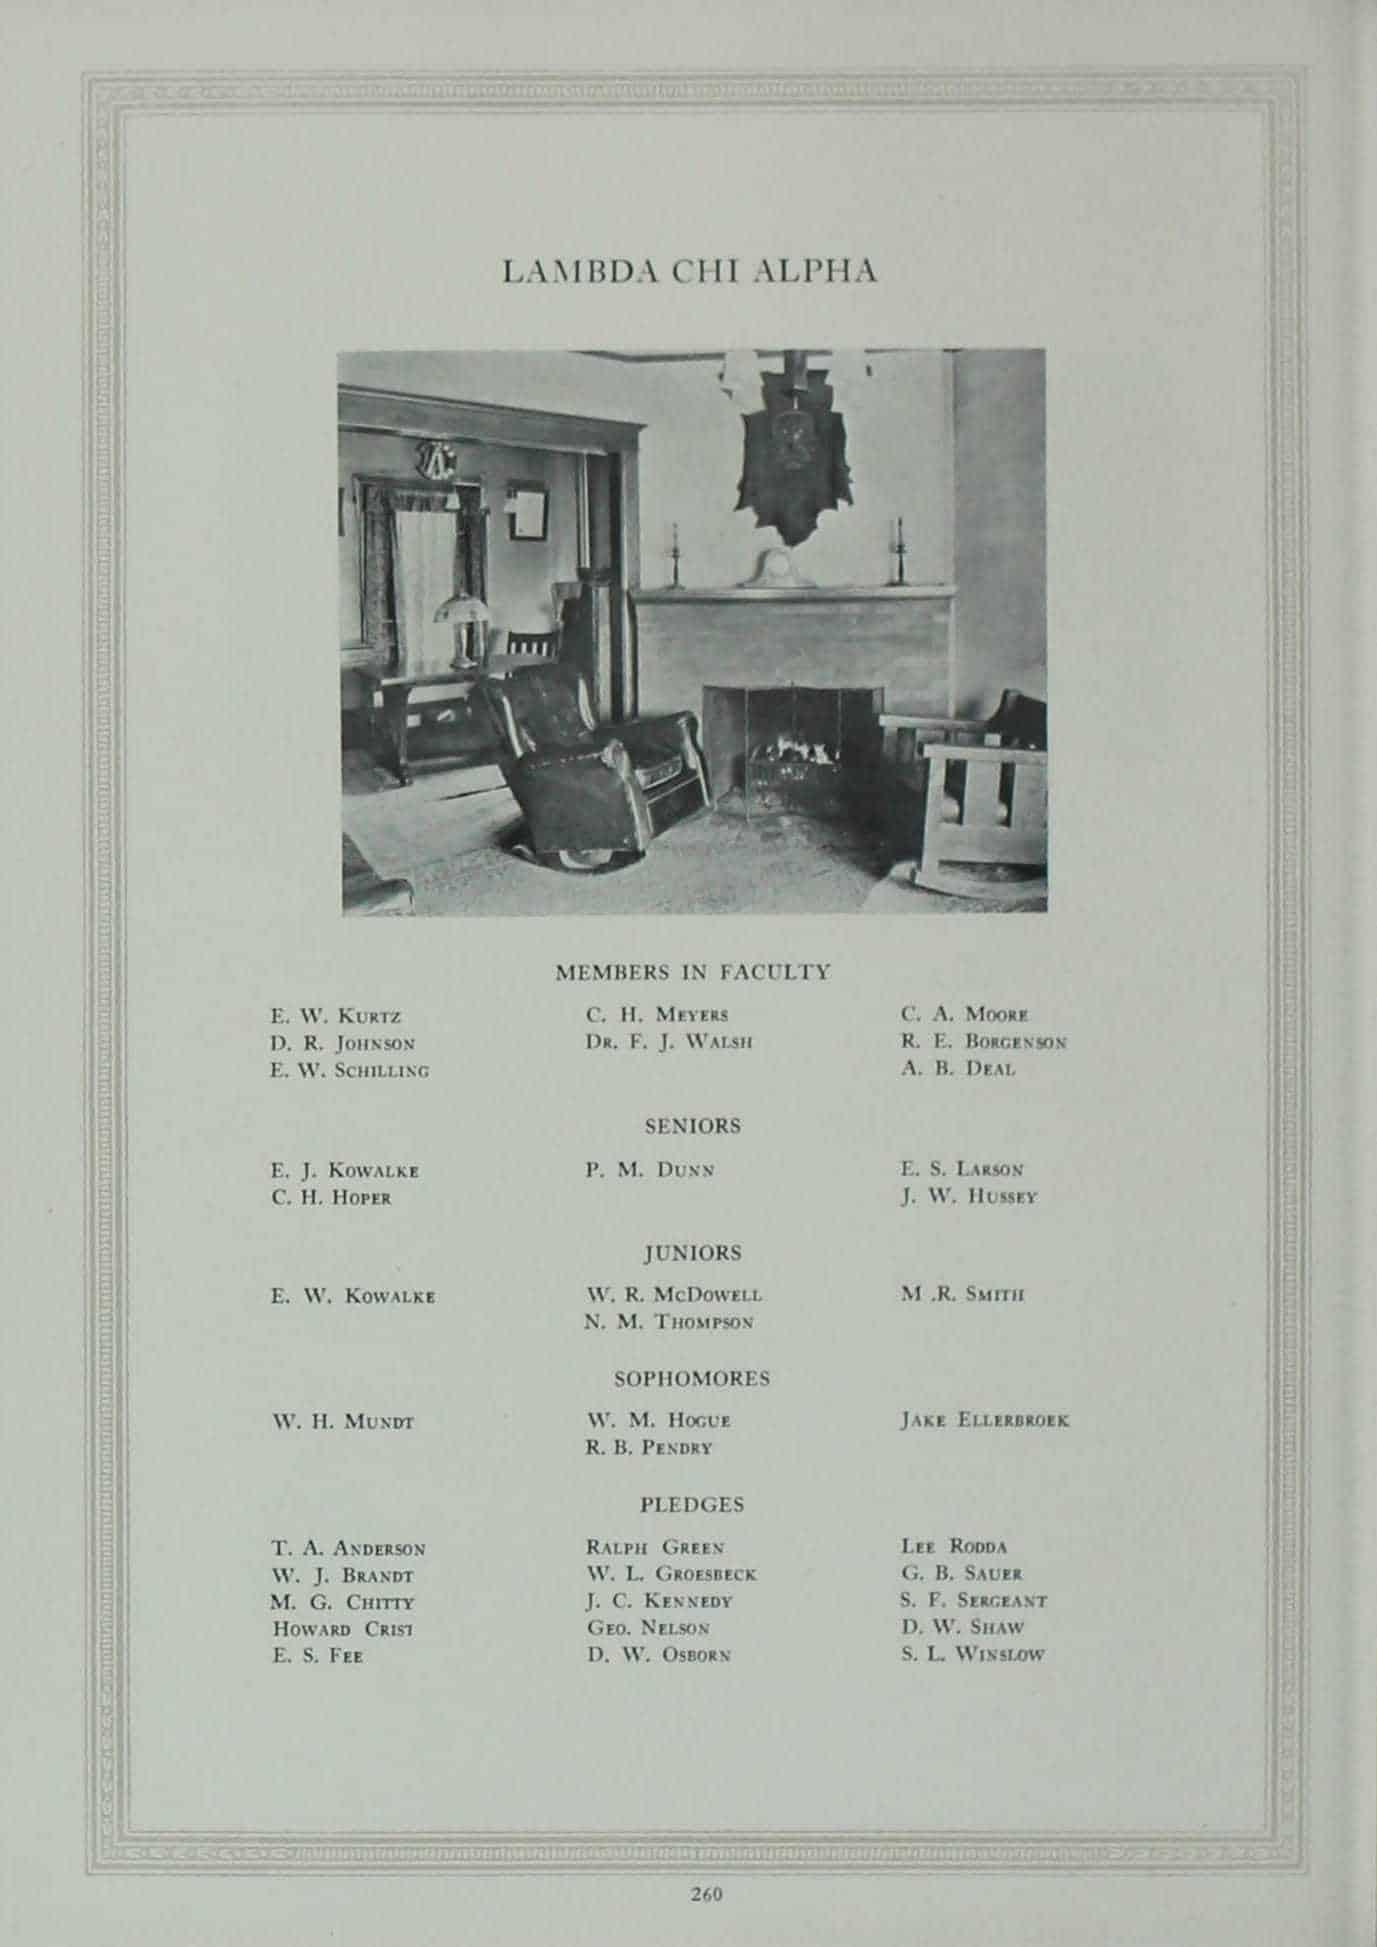 1923 Lambda Chi Alpha Roster